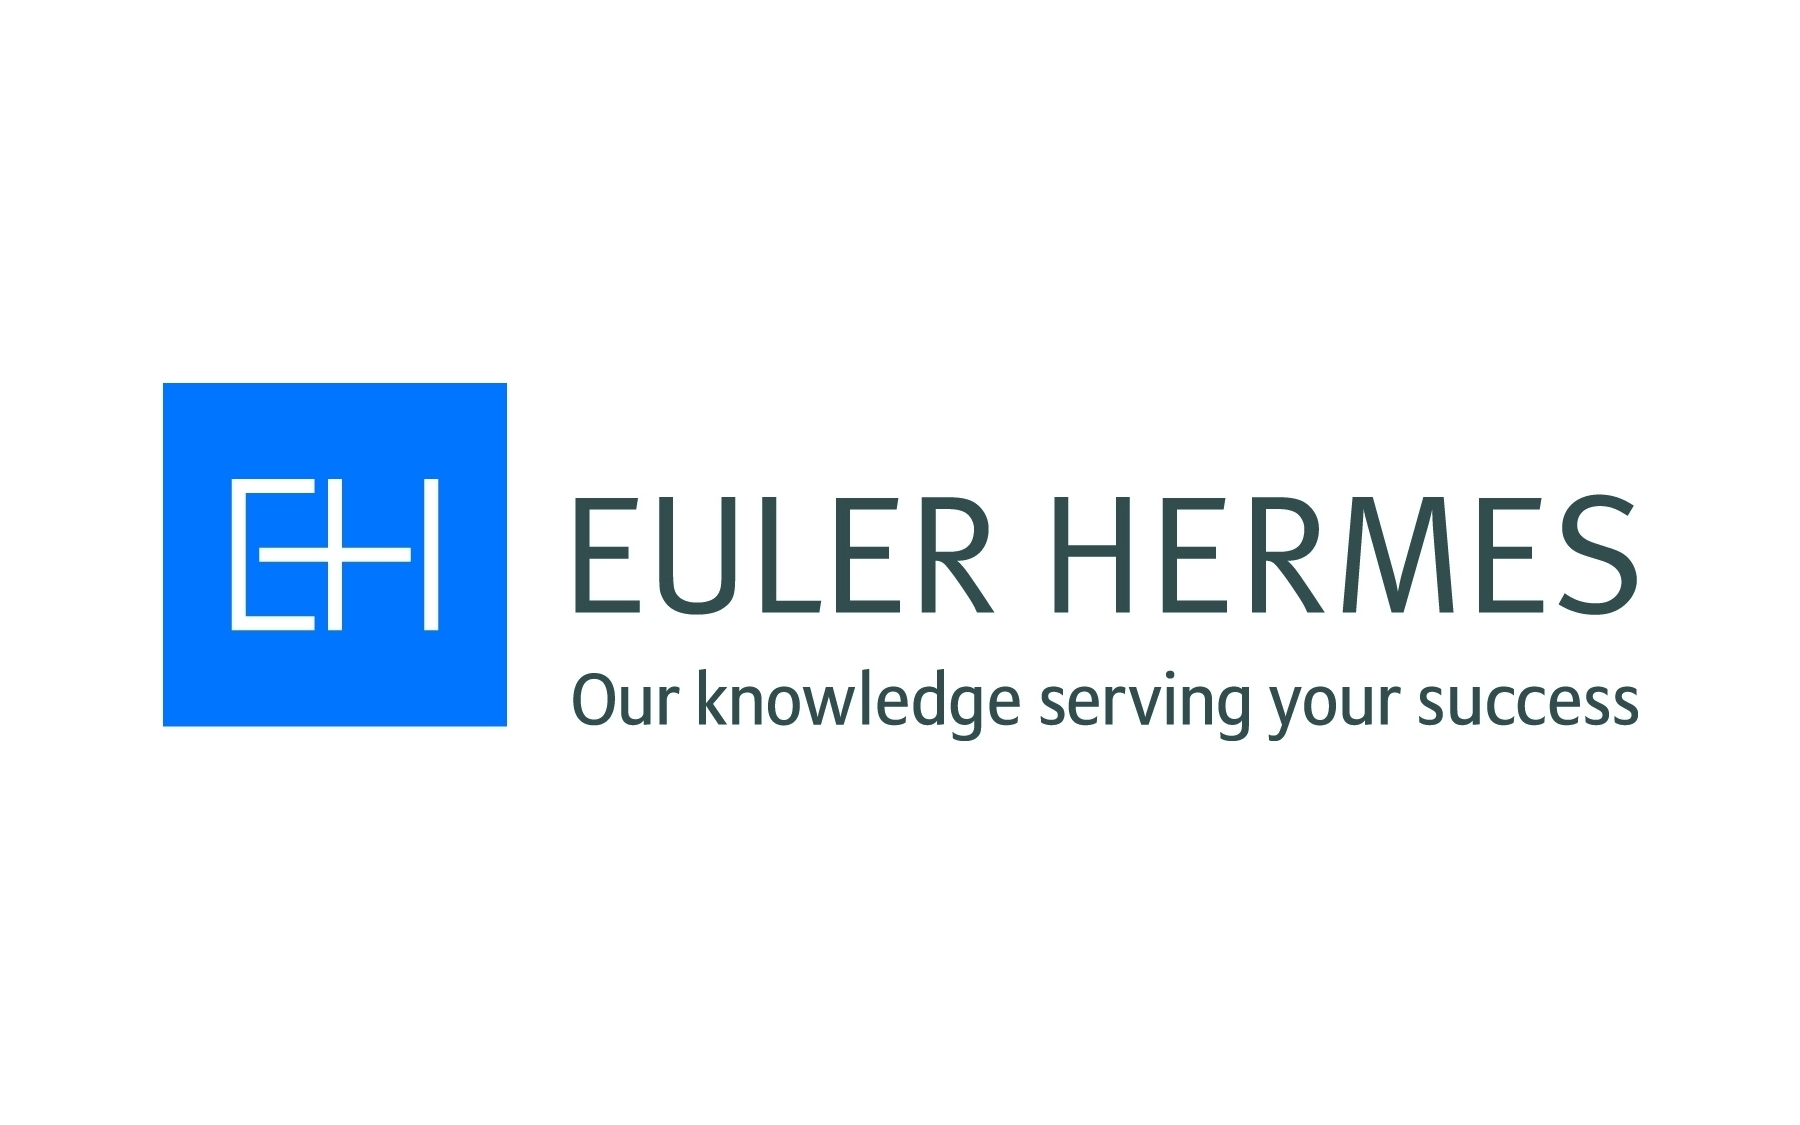 Euler Hermes HiRes HP (2)